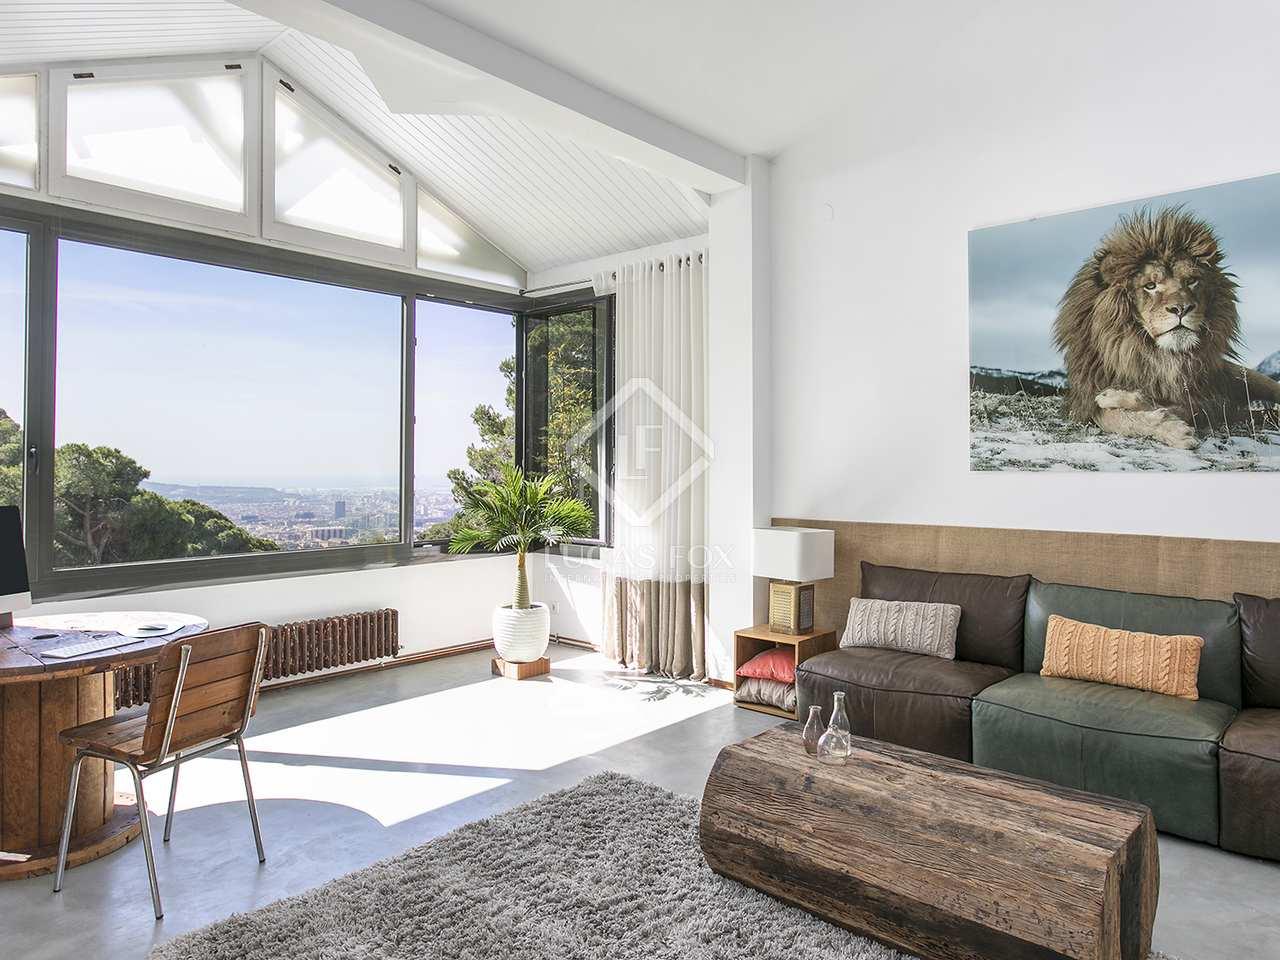 maison villa de 210m a vendre sarri barcelone. Black Bedroom Furniture Sets. Home Design Ideas